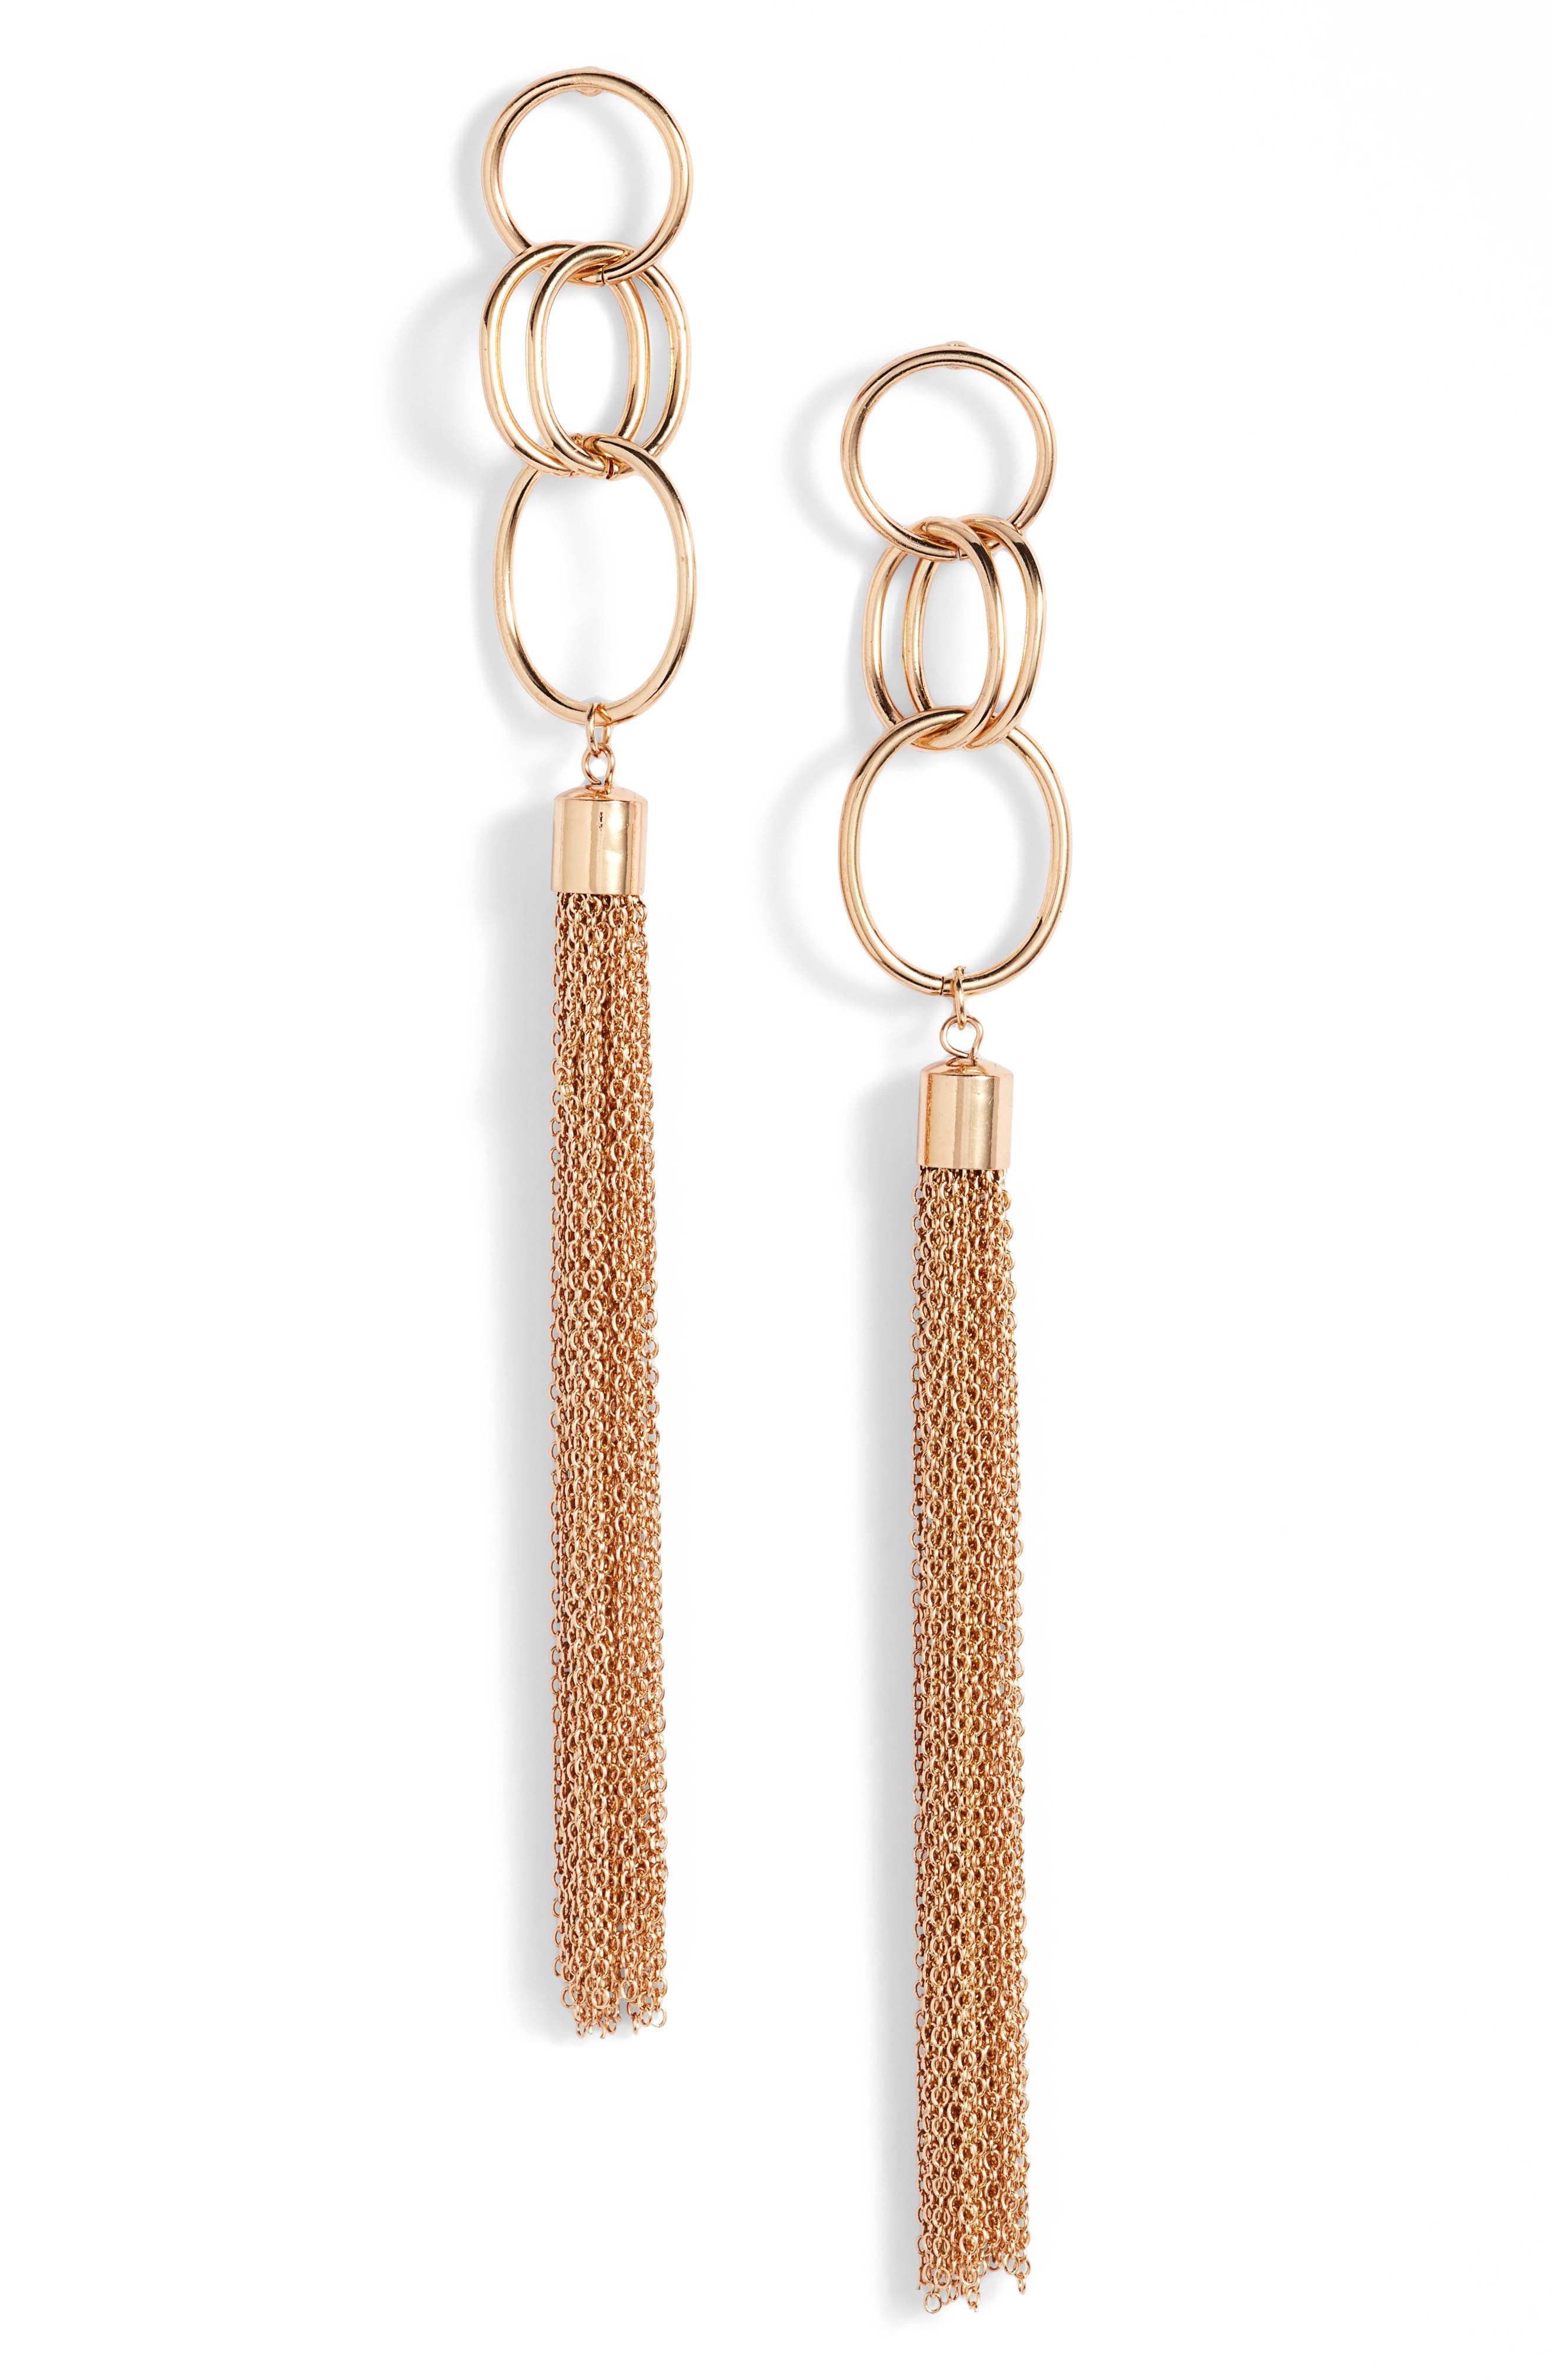 Chain Tassel Drop Earrings,                             Main thumbnail 1, color,                             710